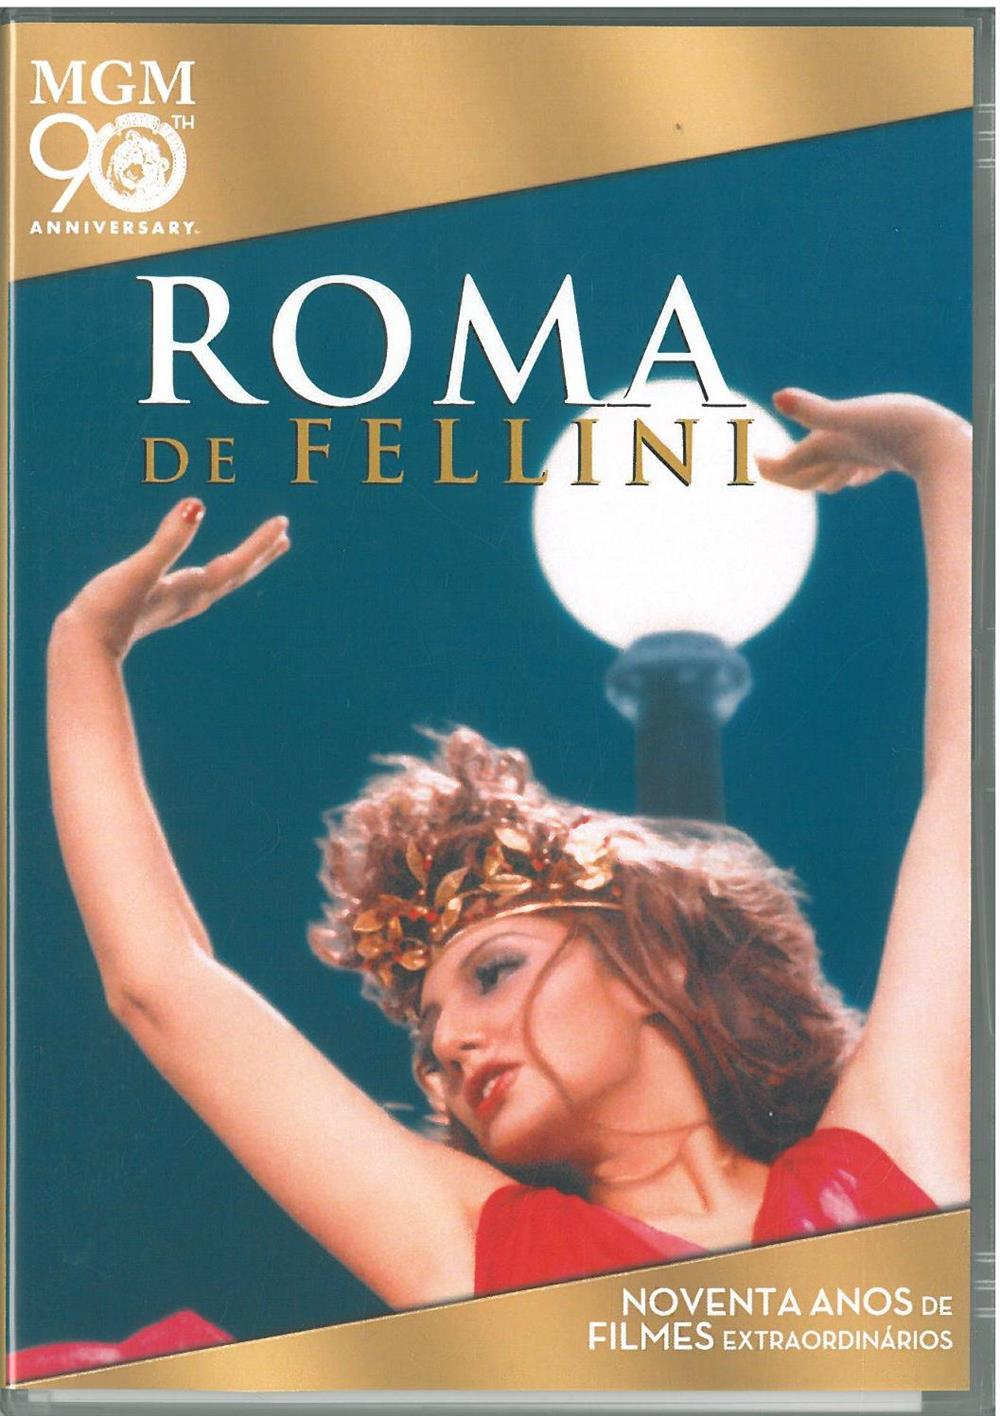 Roma de Fellini_DVD.jpg